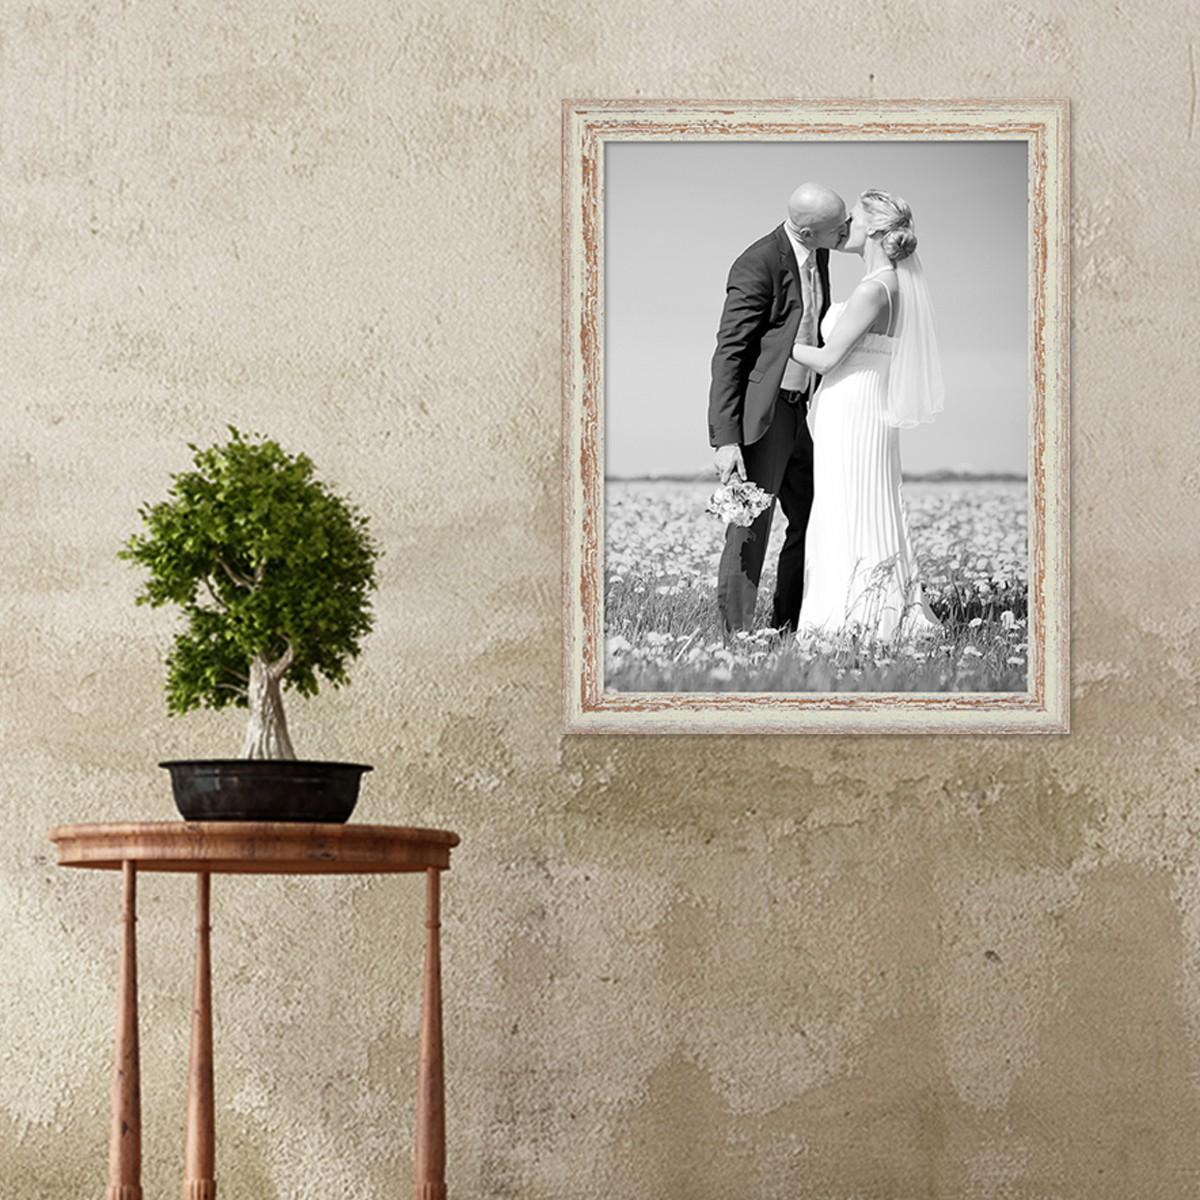 Vintage Bilderrahmen 40x50 cm Weiss Shabby-Chic Massivholz mit ...